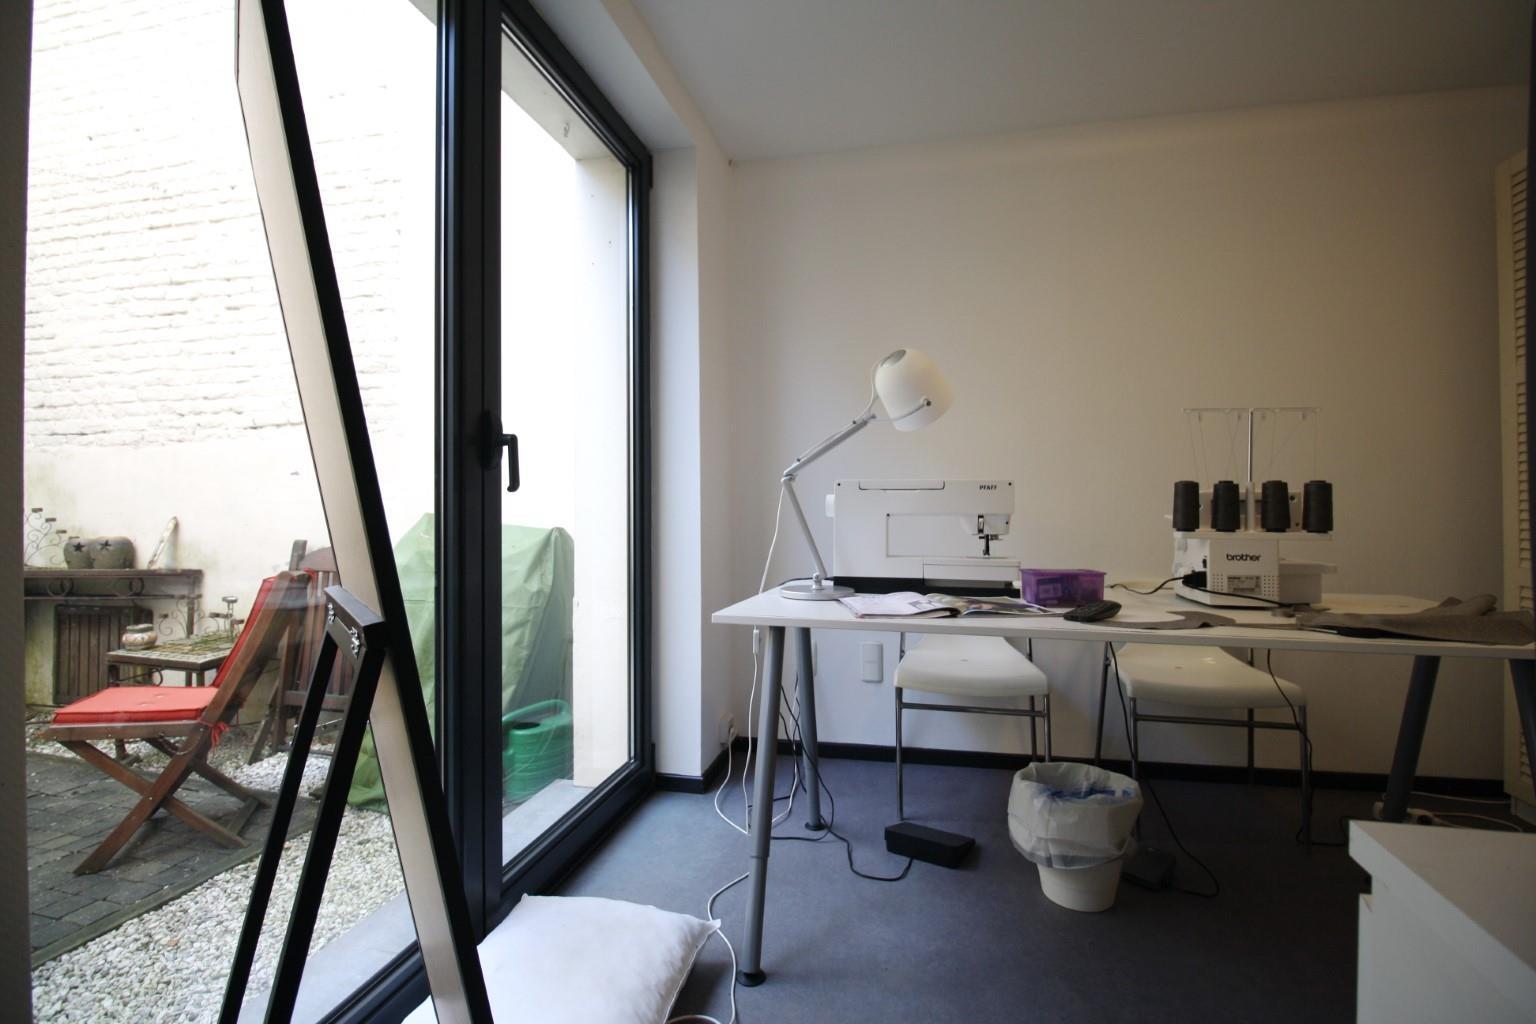 Maison - Laeken - #3014834-15